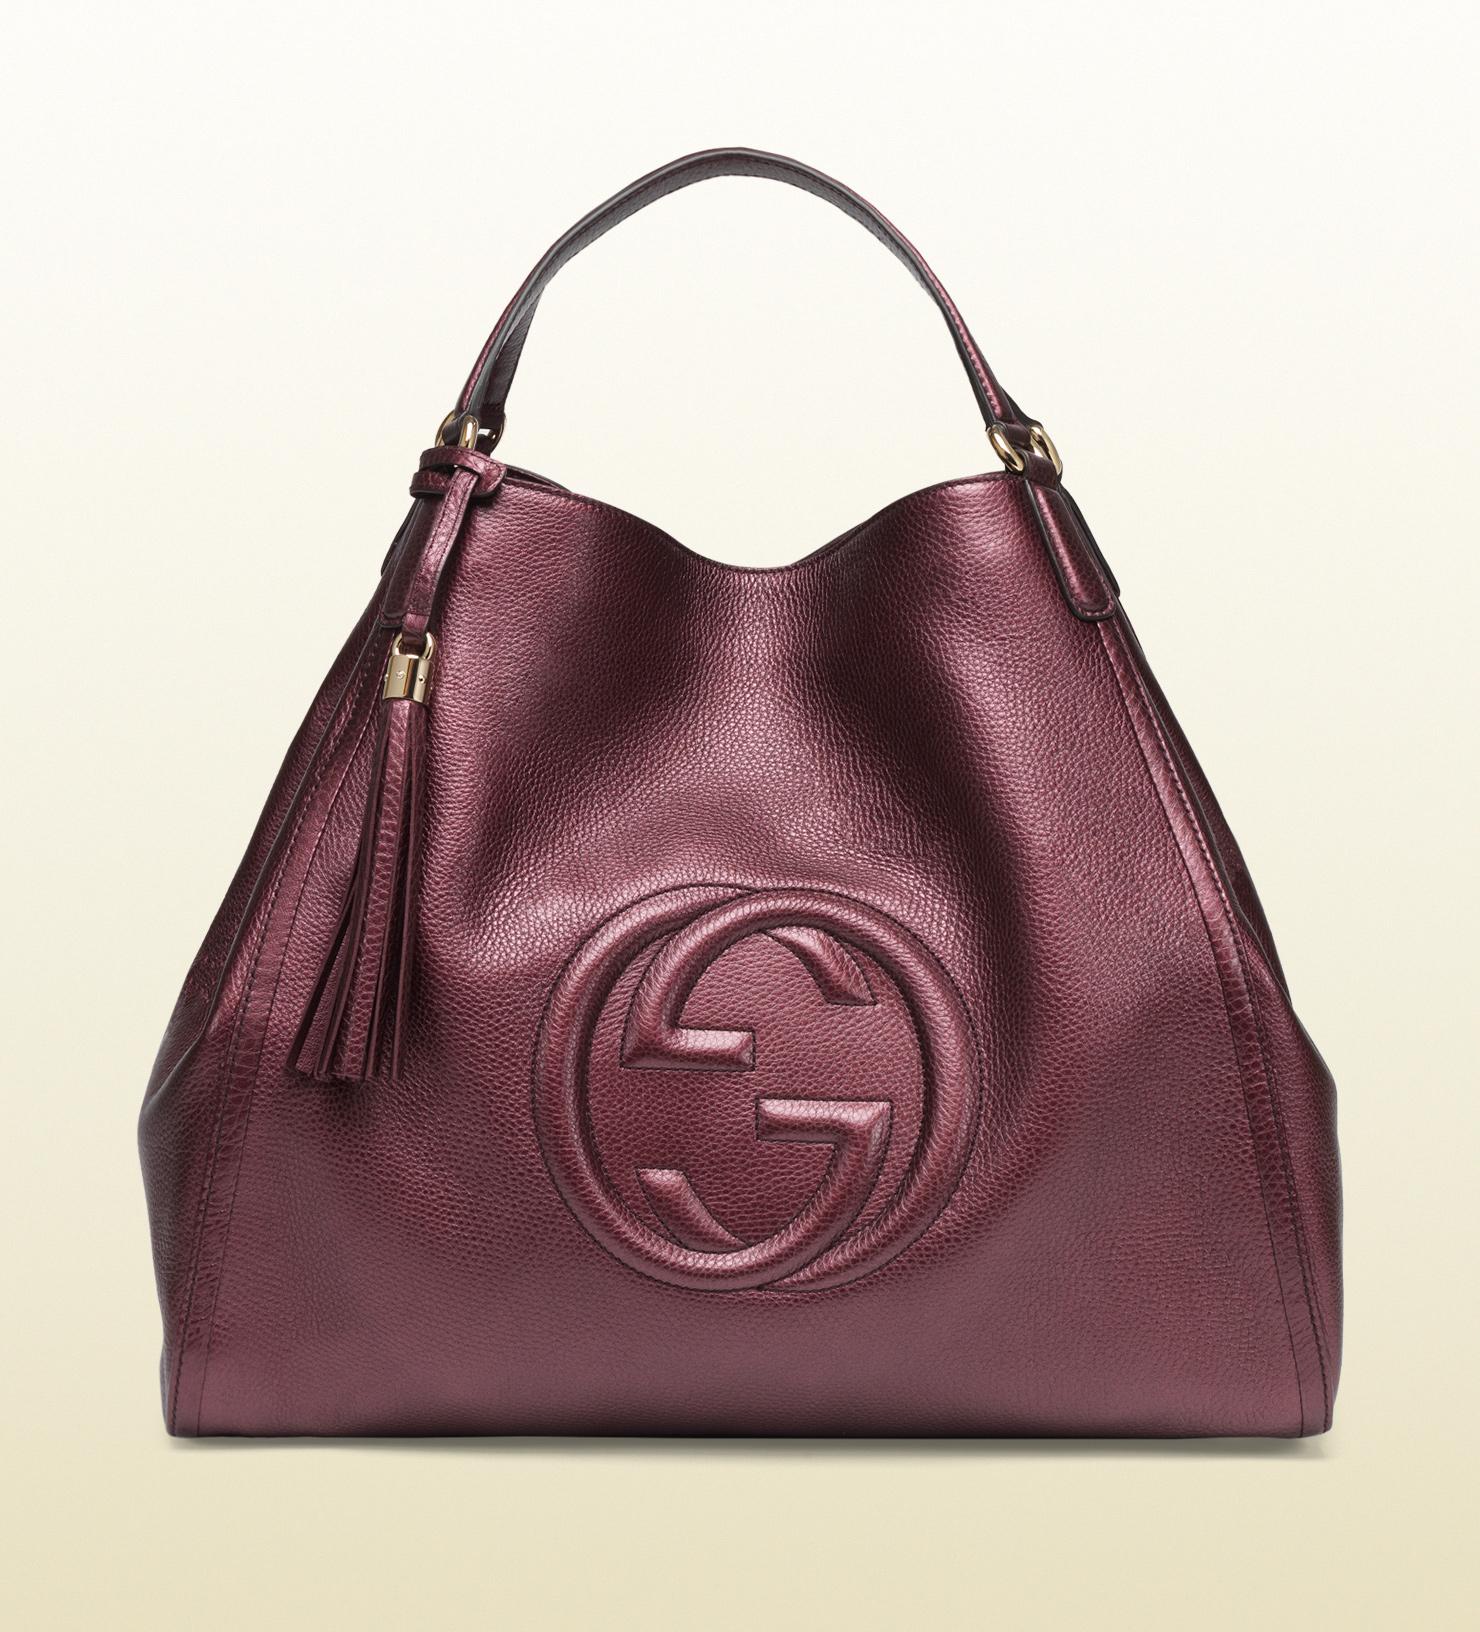 c238eb934188 Gucci Soho Metallic Leather Shoulder Bag in Purple (burgundy)   Lyst